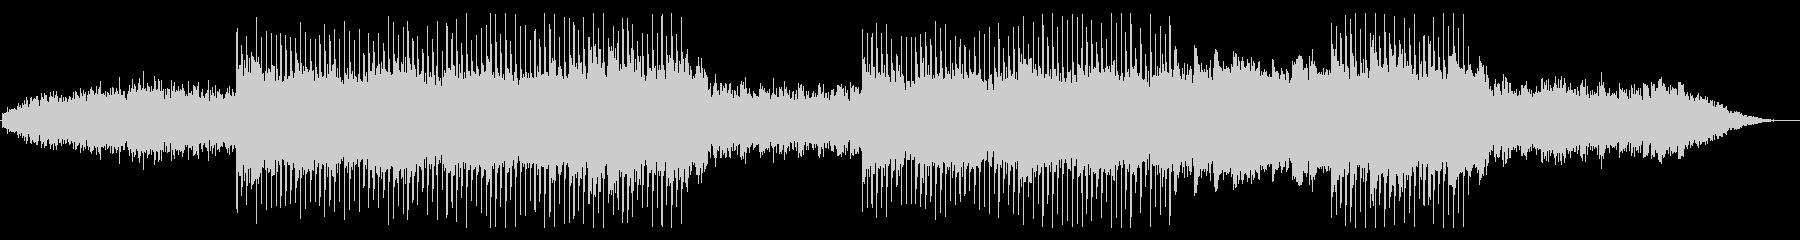 bgm34の未再生の波形